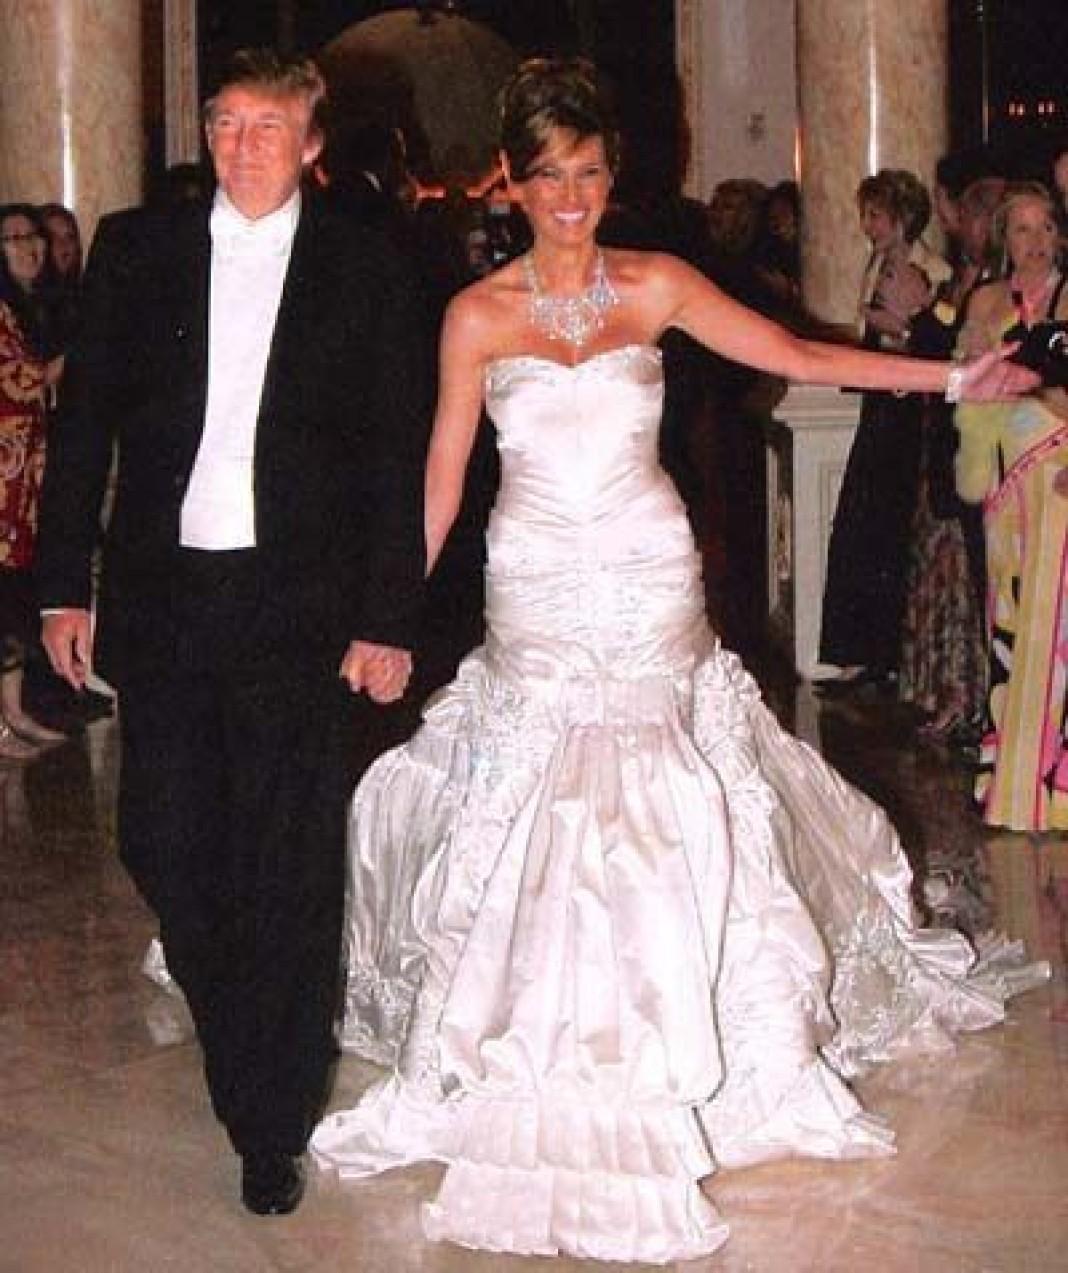 мелания трамп свадьба фото смотря